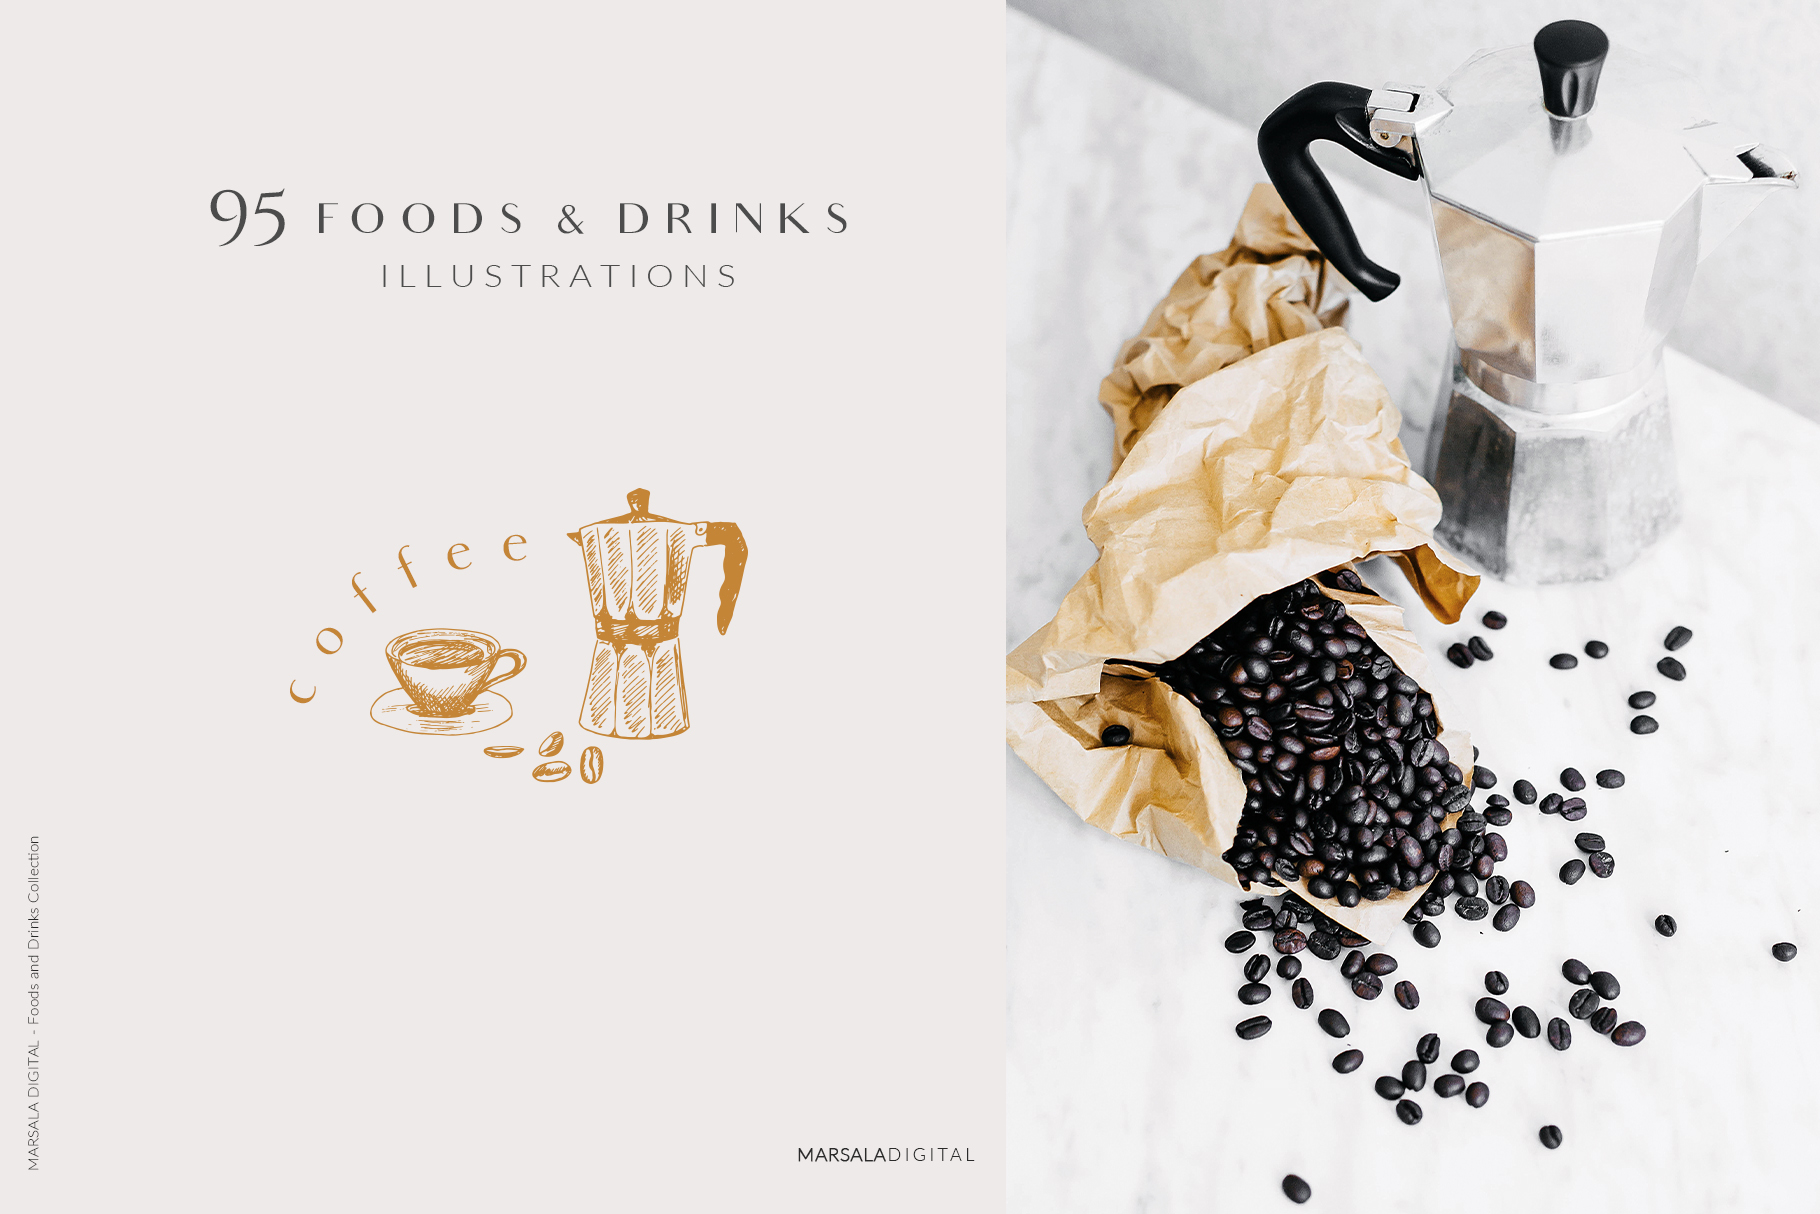 Foods & Drinks Logo Elements Handrawn Graphics example image 3